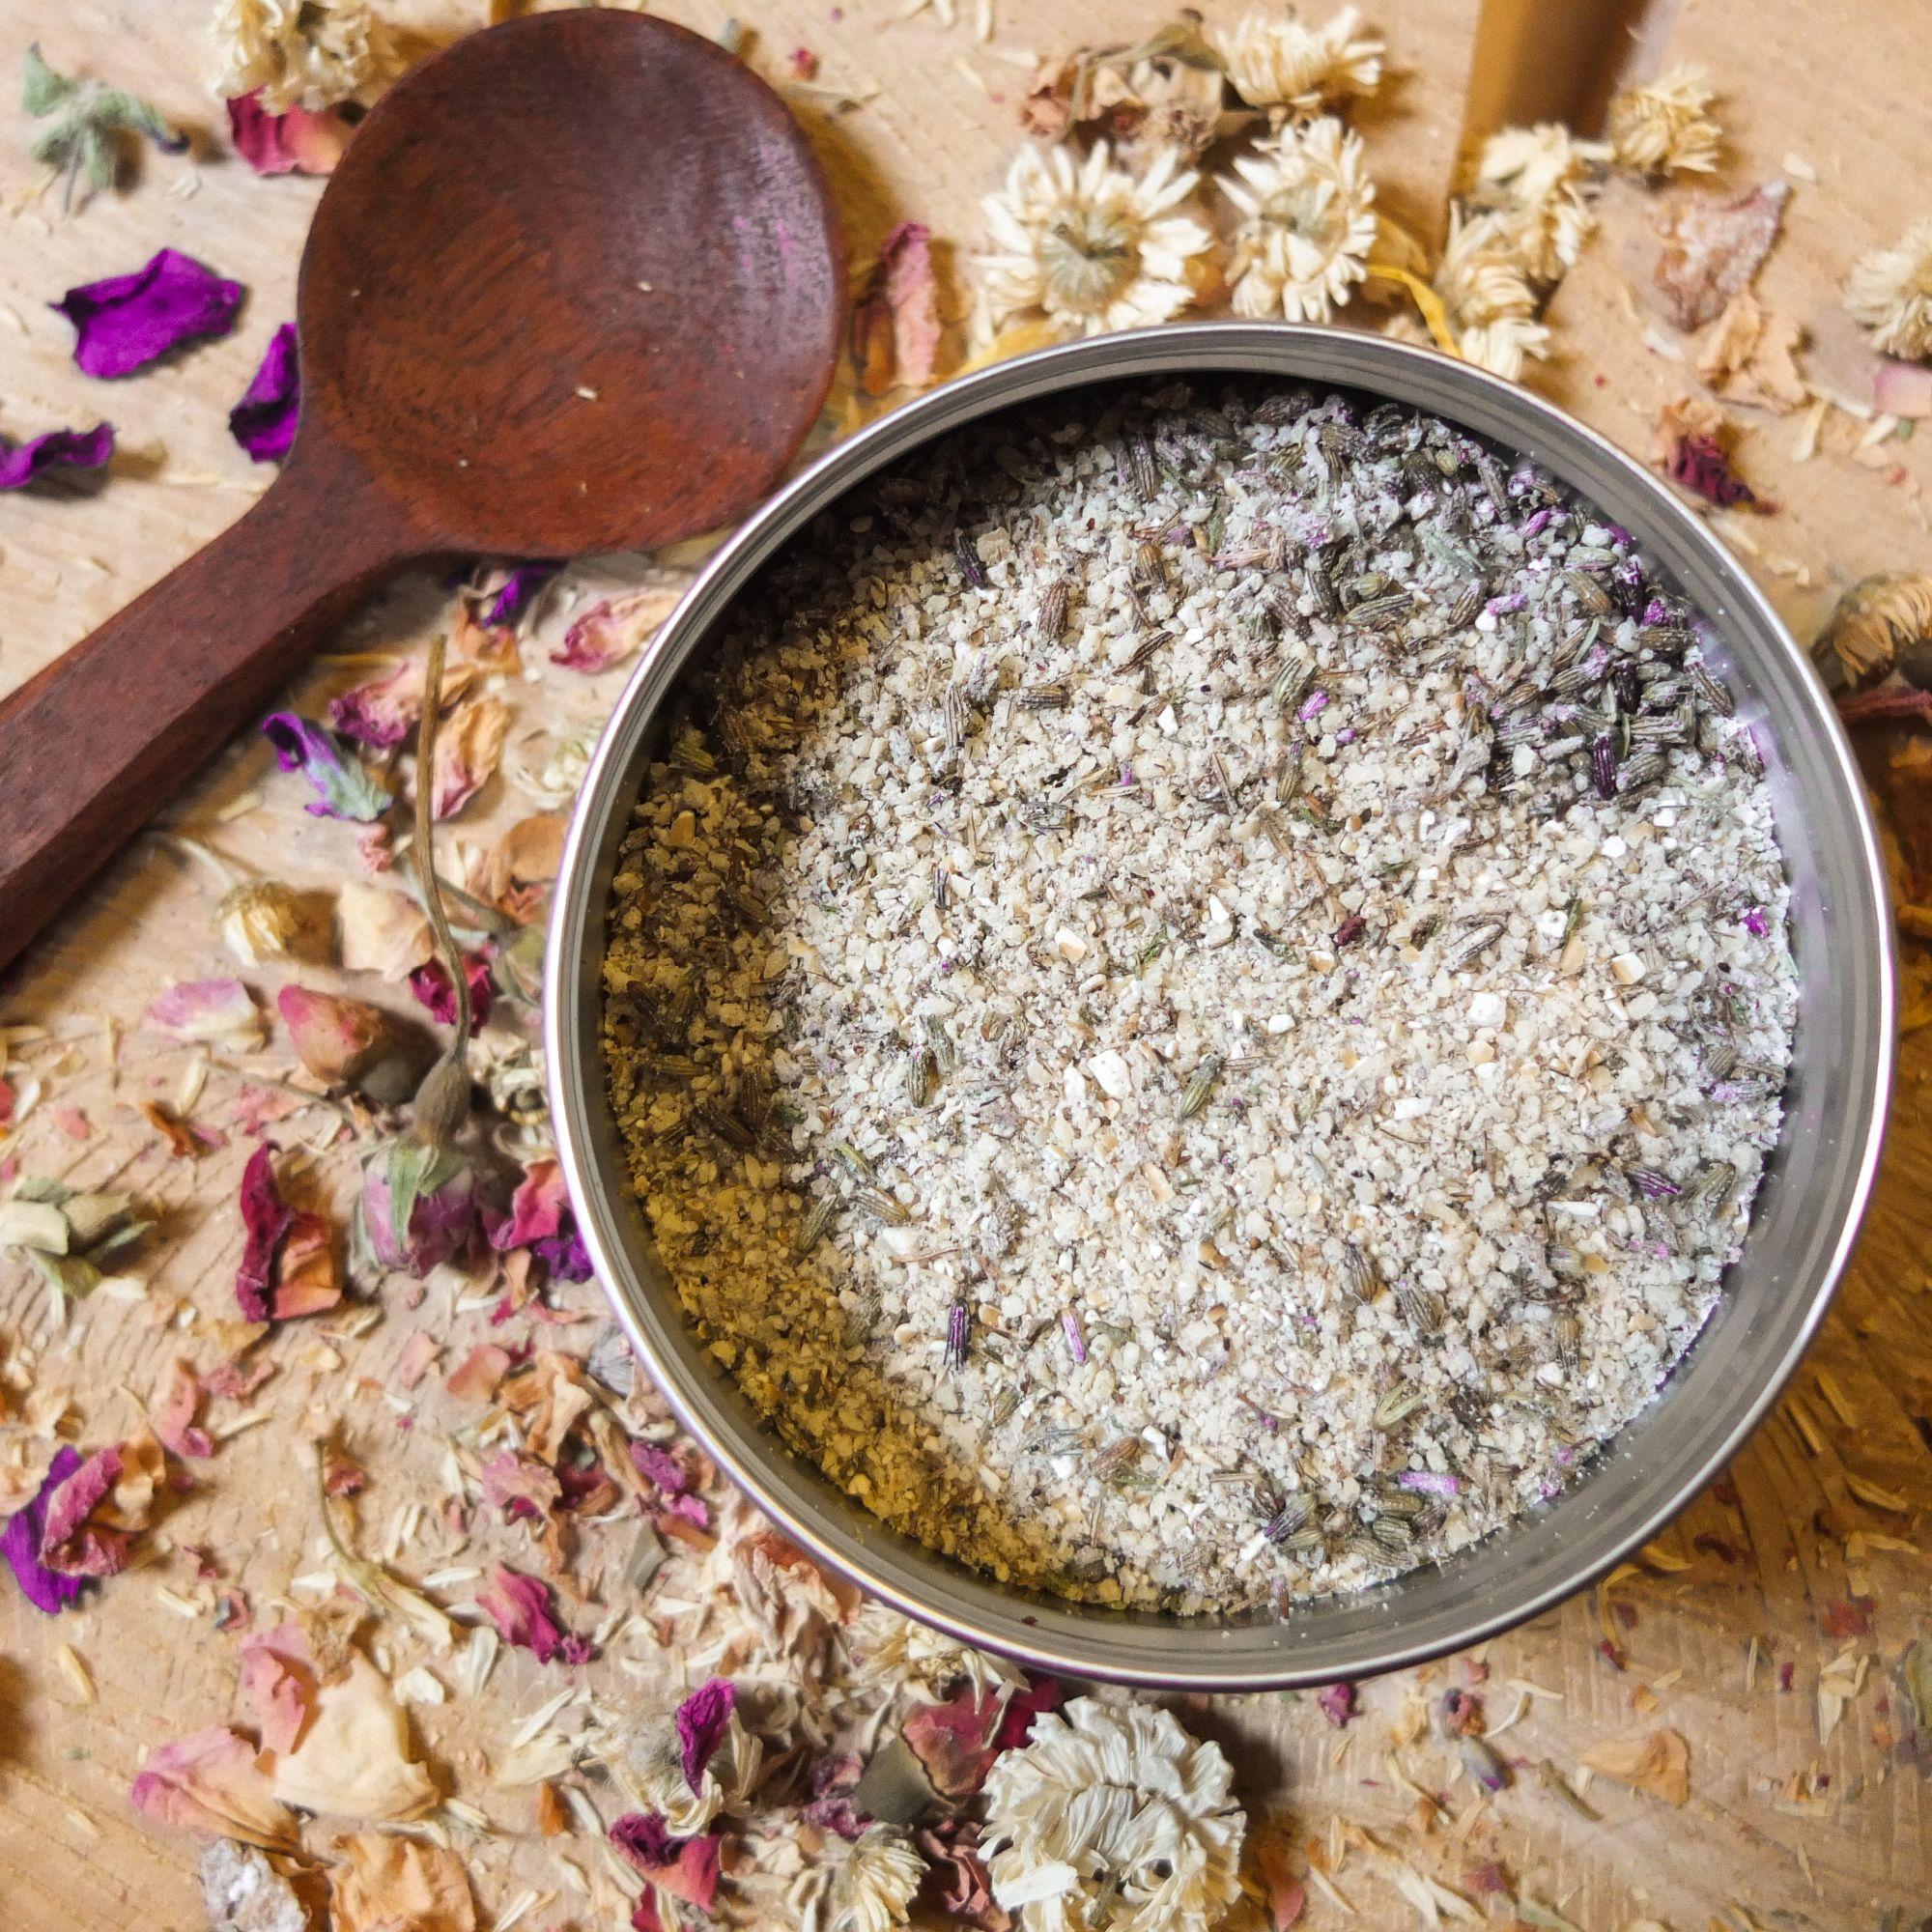 Lavender & Oat Gentle Facial Scrub